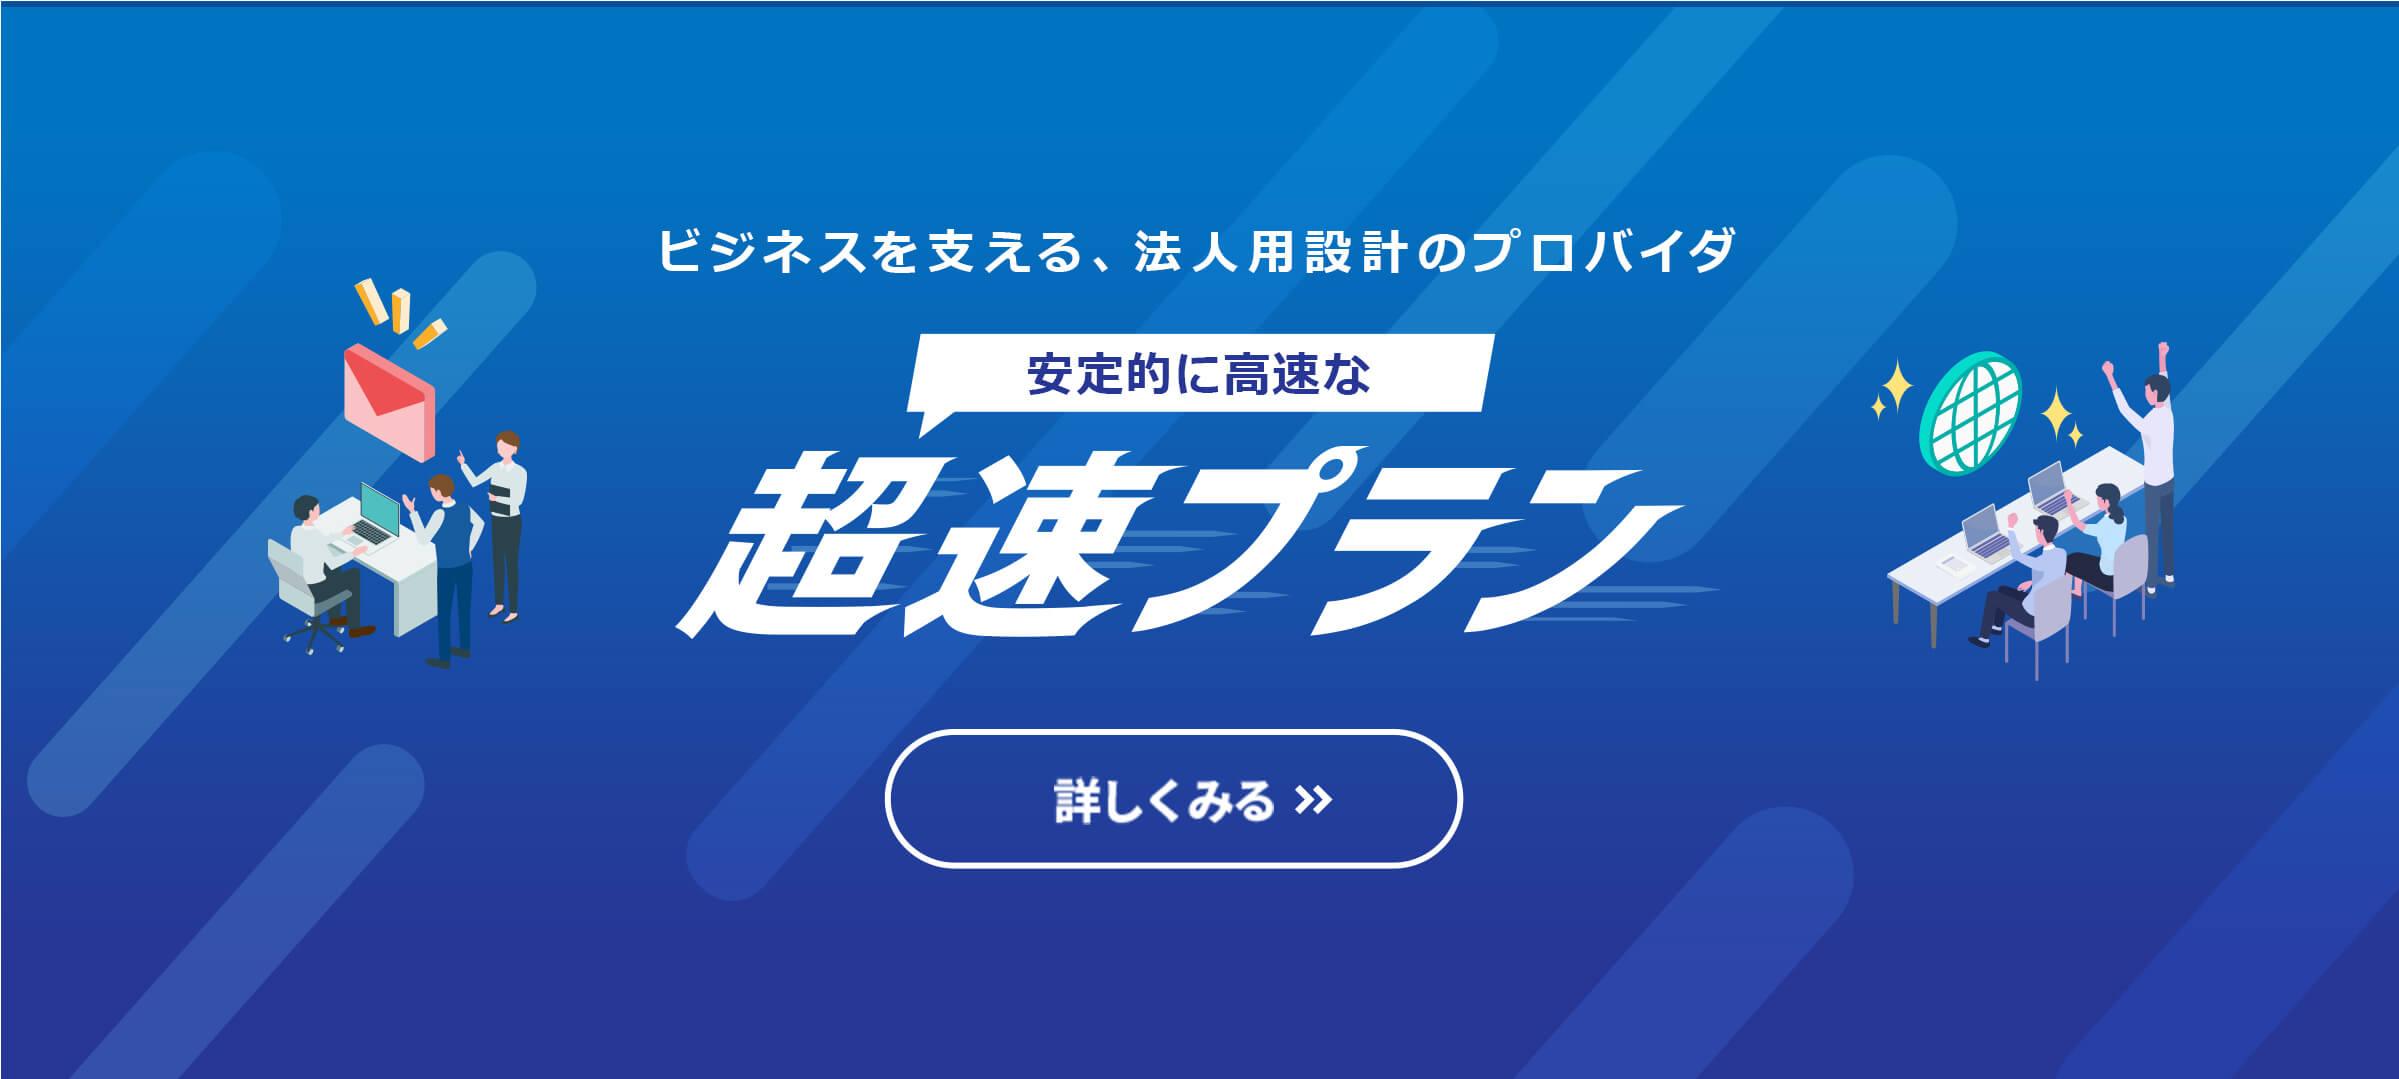 WEB申し込み限定!転用・事業者変更の場合契約手数料無料! 新規開設の場合回線工事費無料!